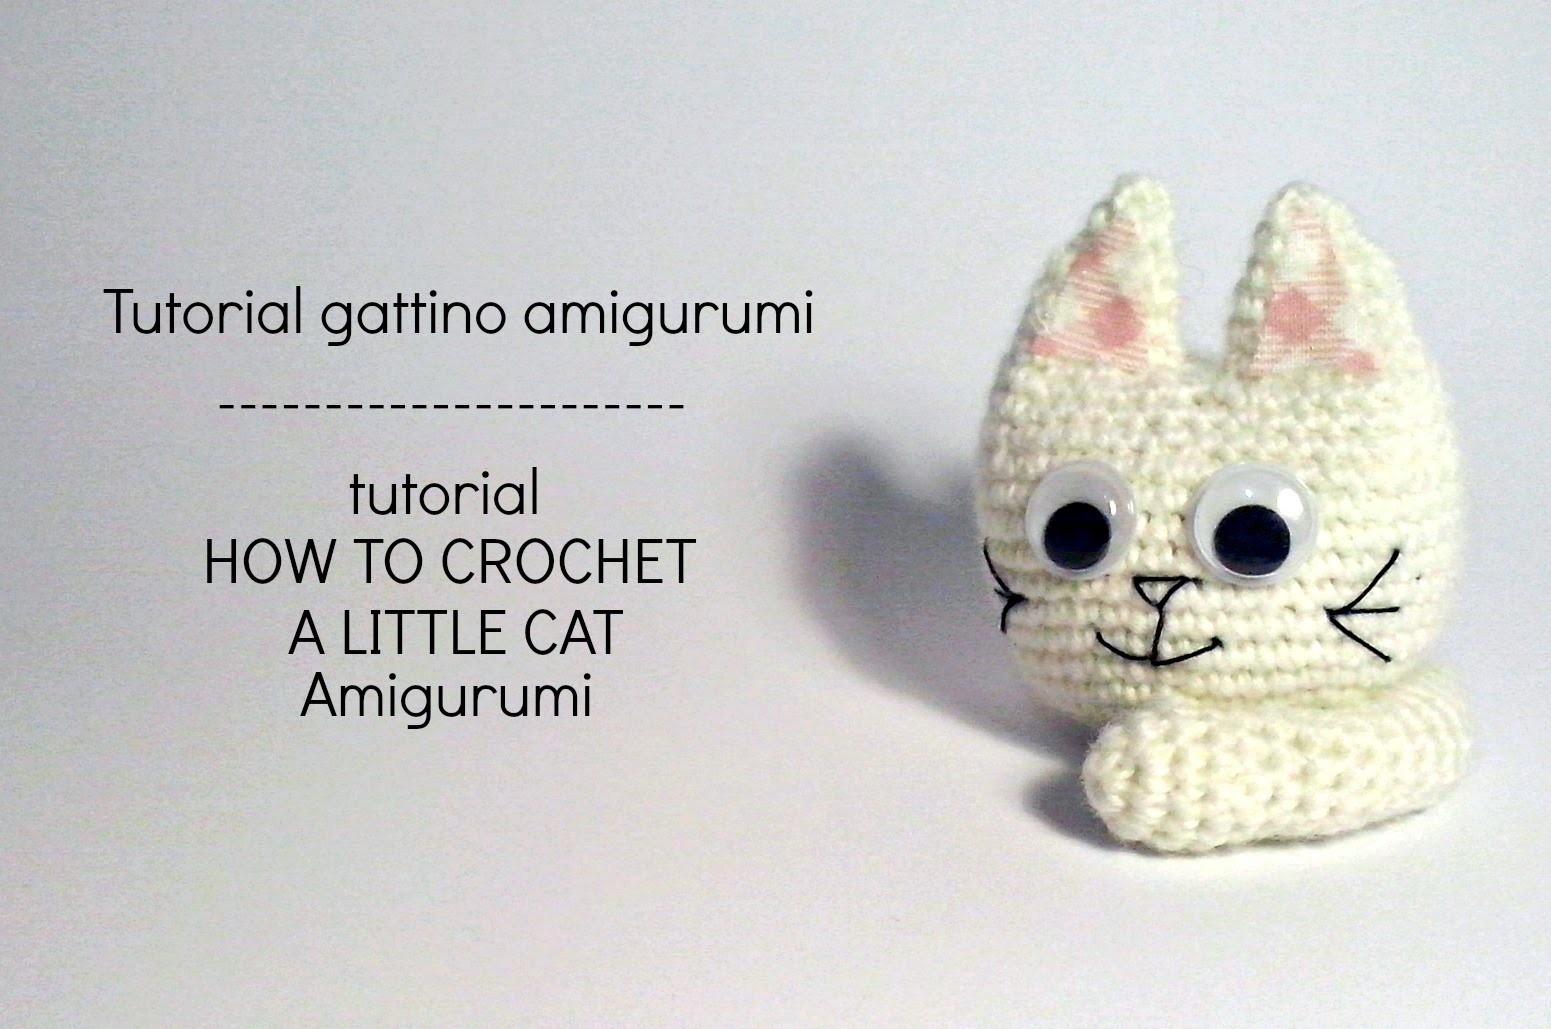 Tutorial Gattino Amigurumi | HOW TO CROCHET A LITTLE CAT Amigurumi